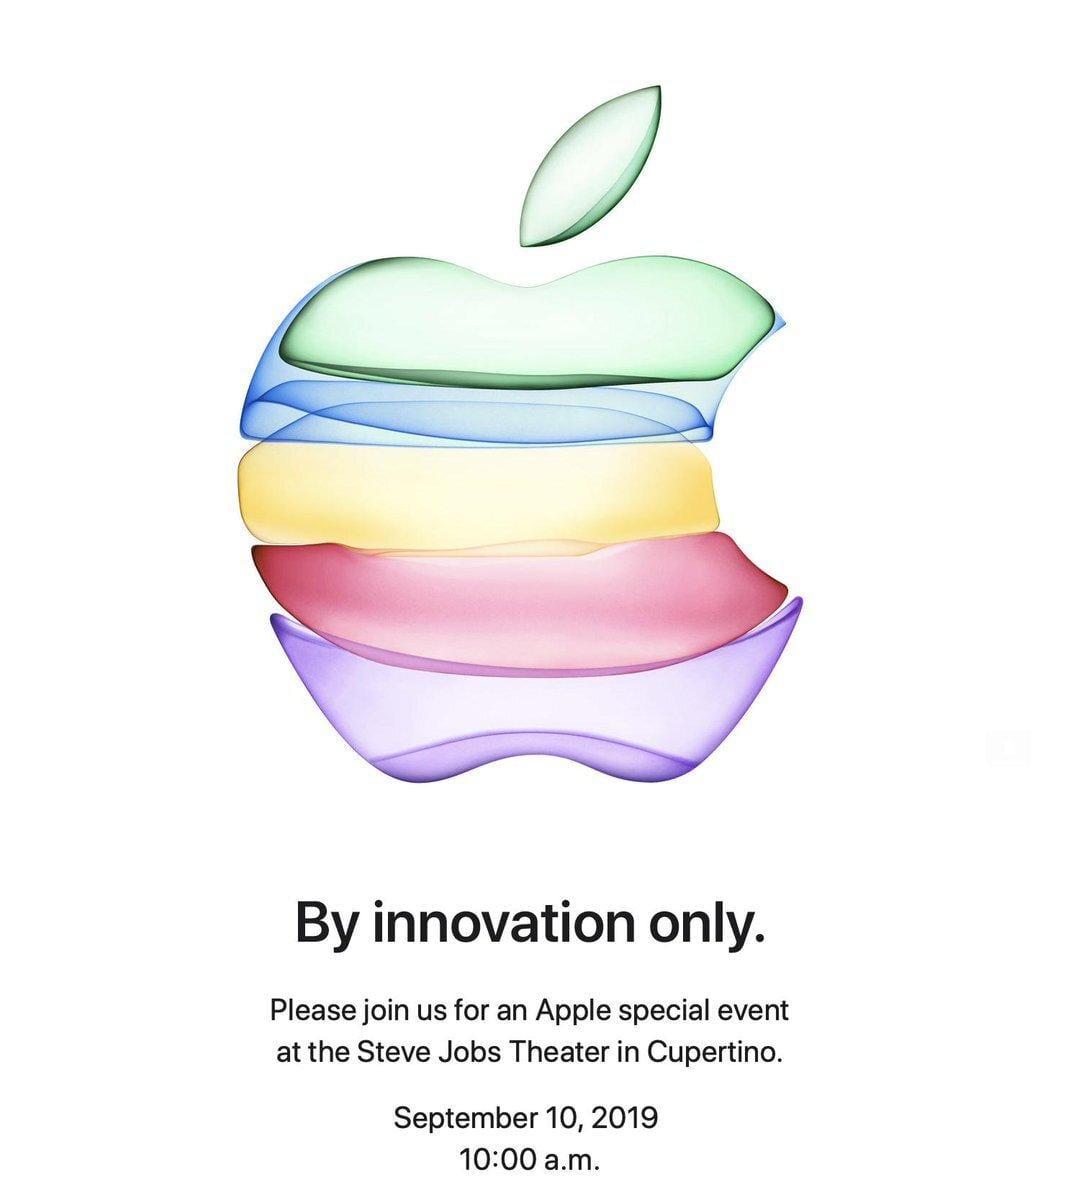 iPhone 11 и что ещё покажут на презентации Apple 10 сентября? (168)